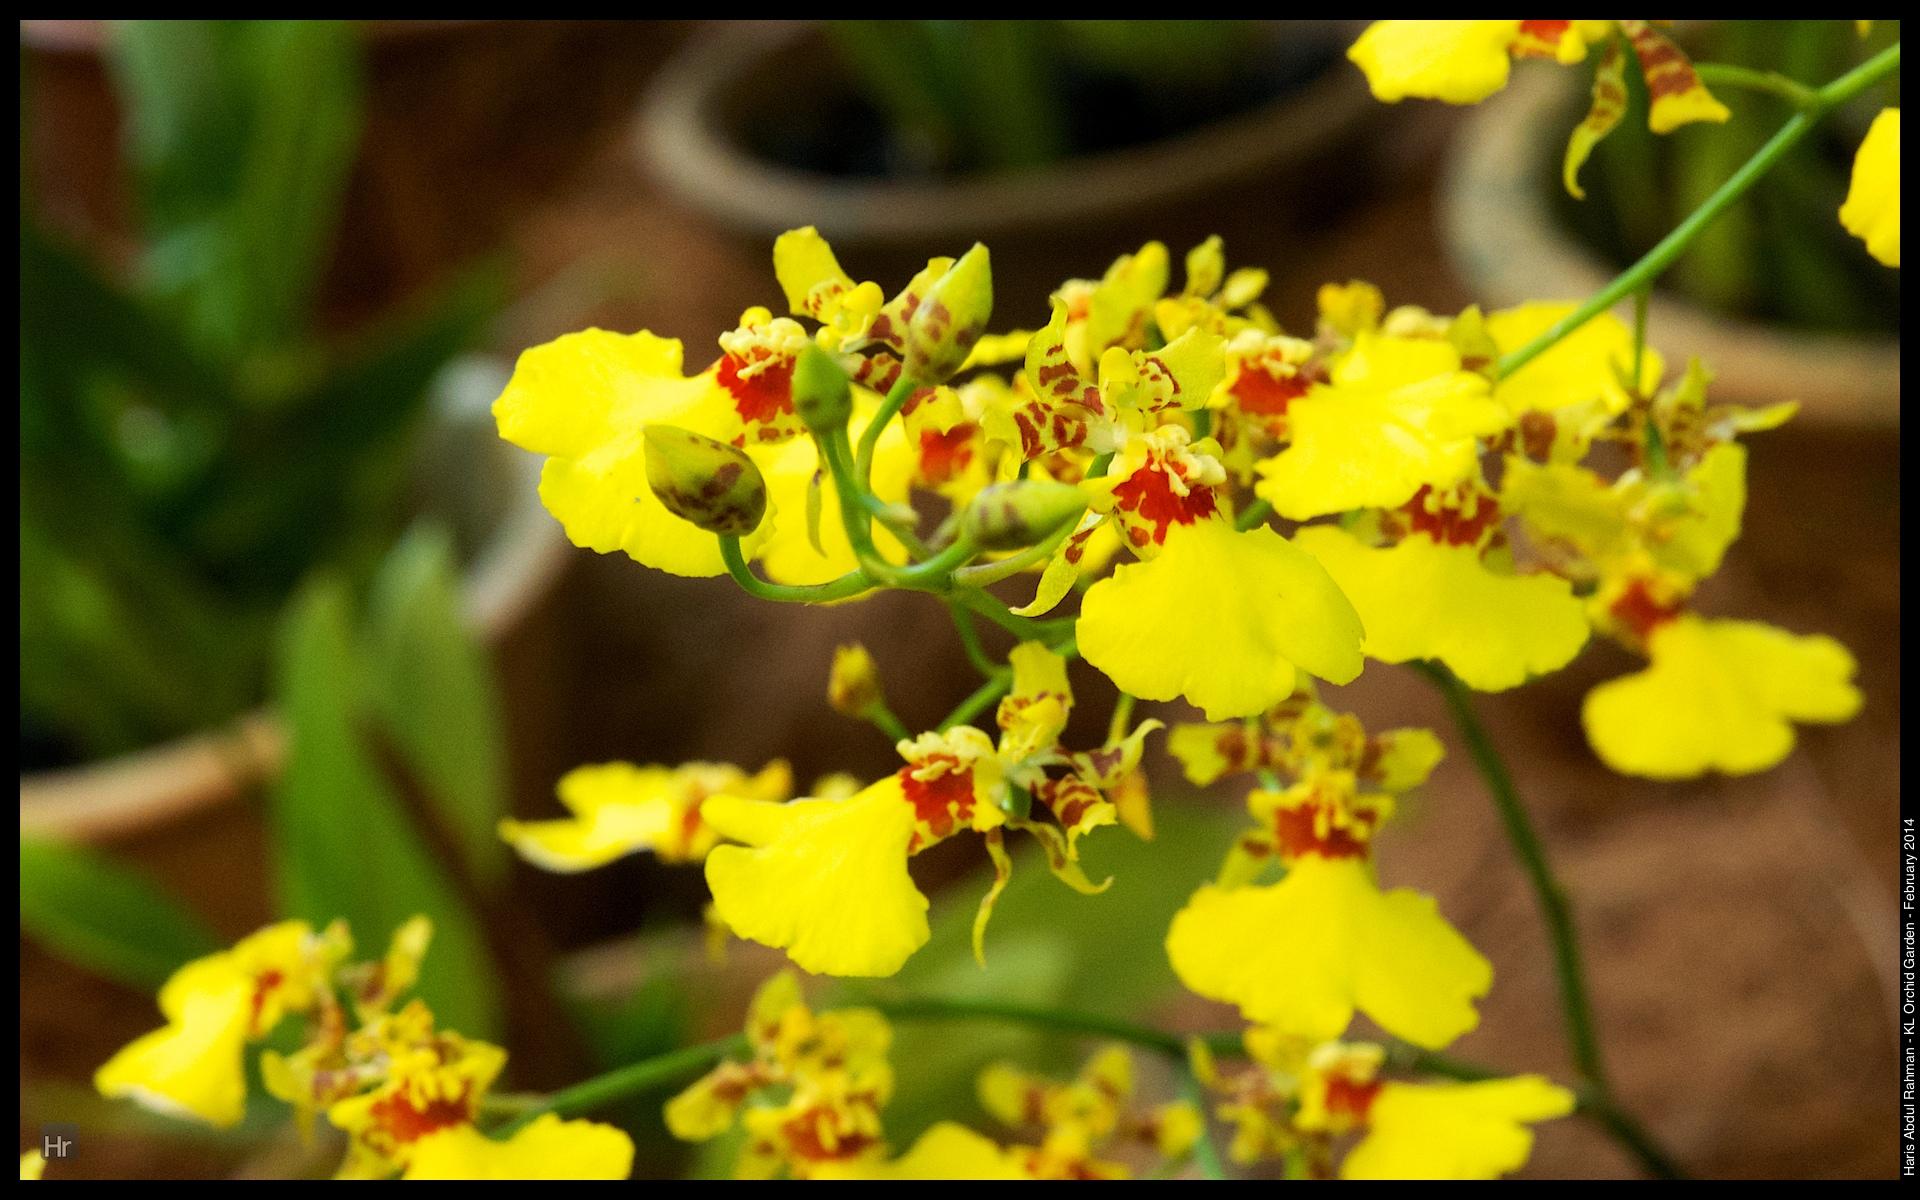 140223 Orchid Garden 16.jpg